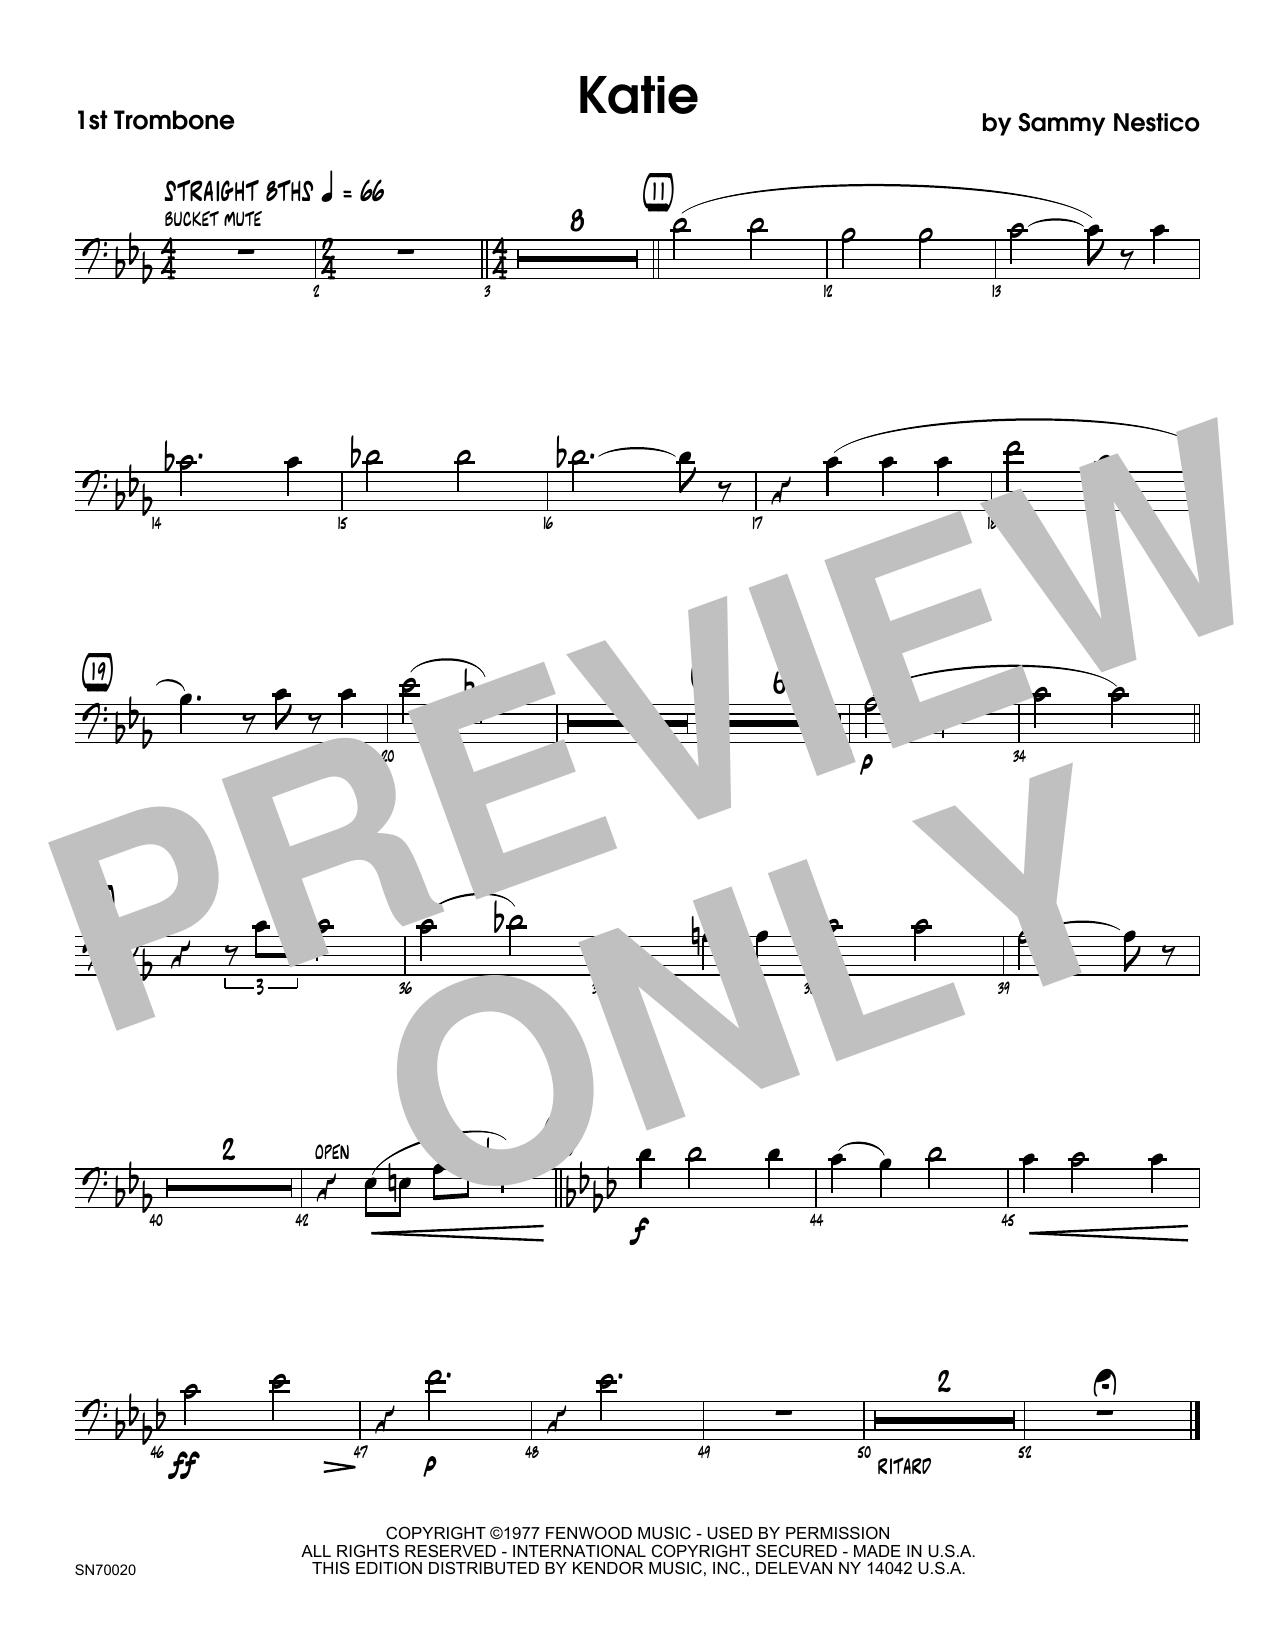 Katie - 1st Trombone Sheet Music